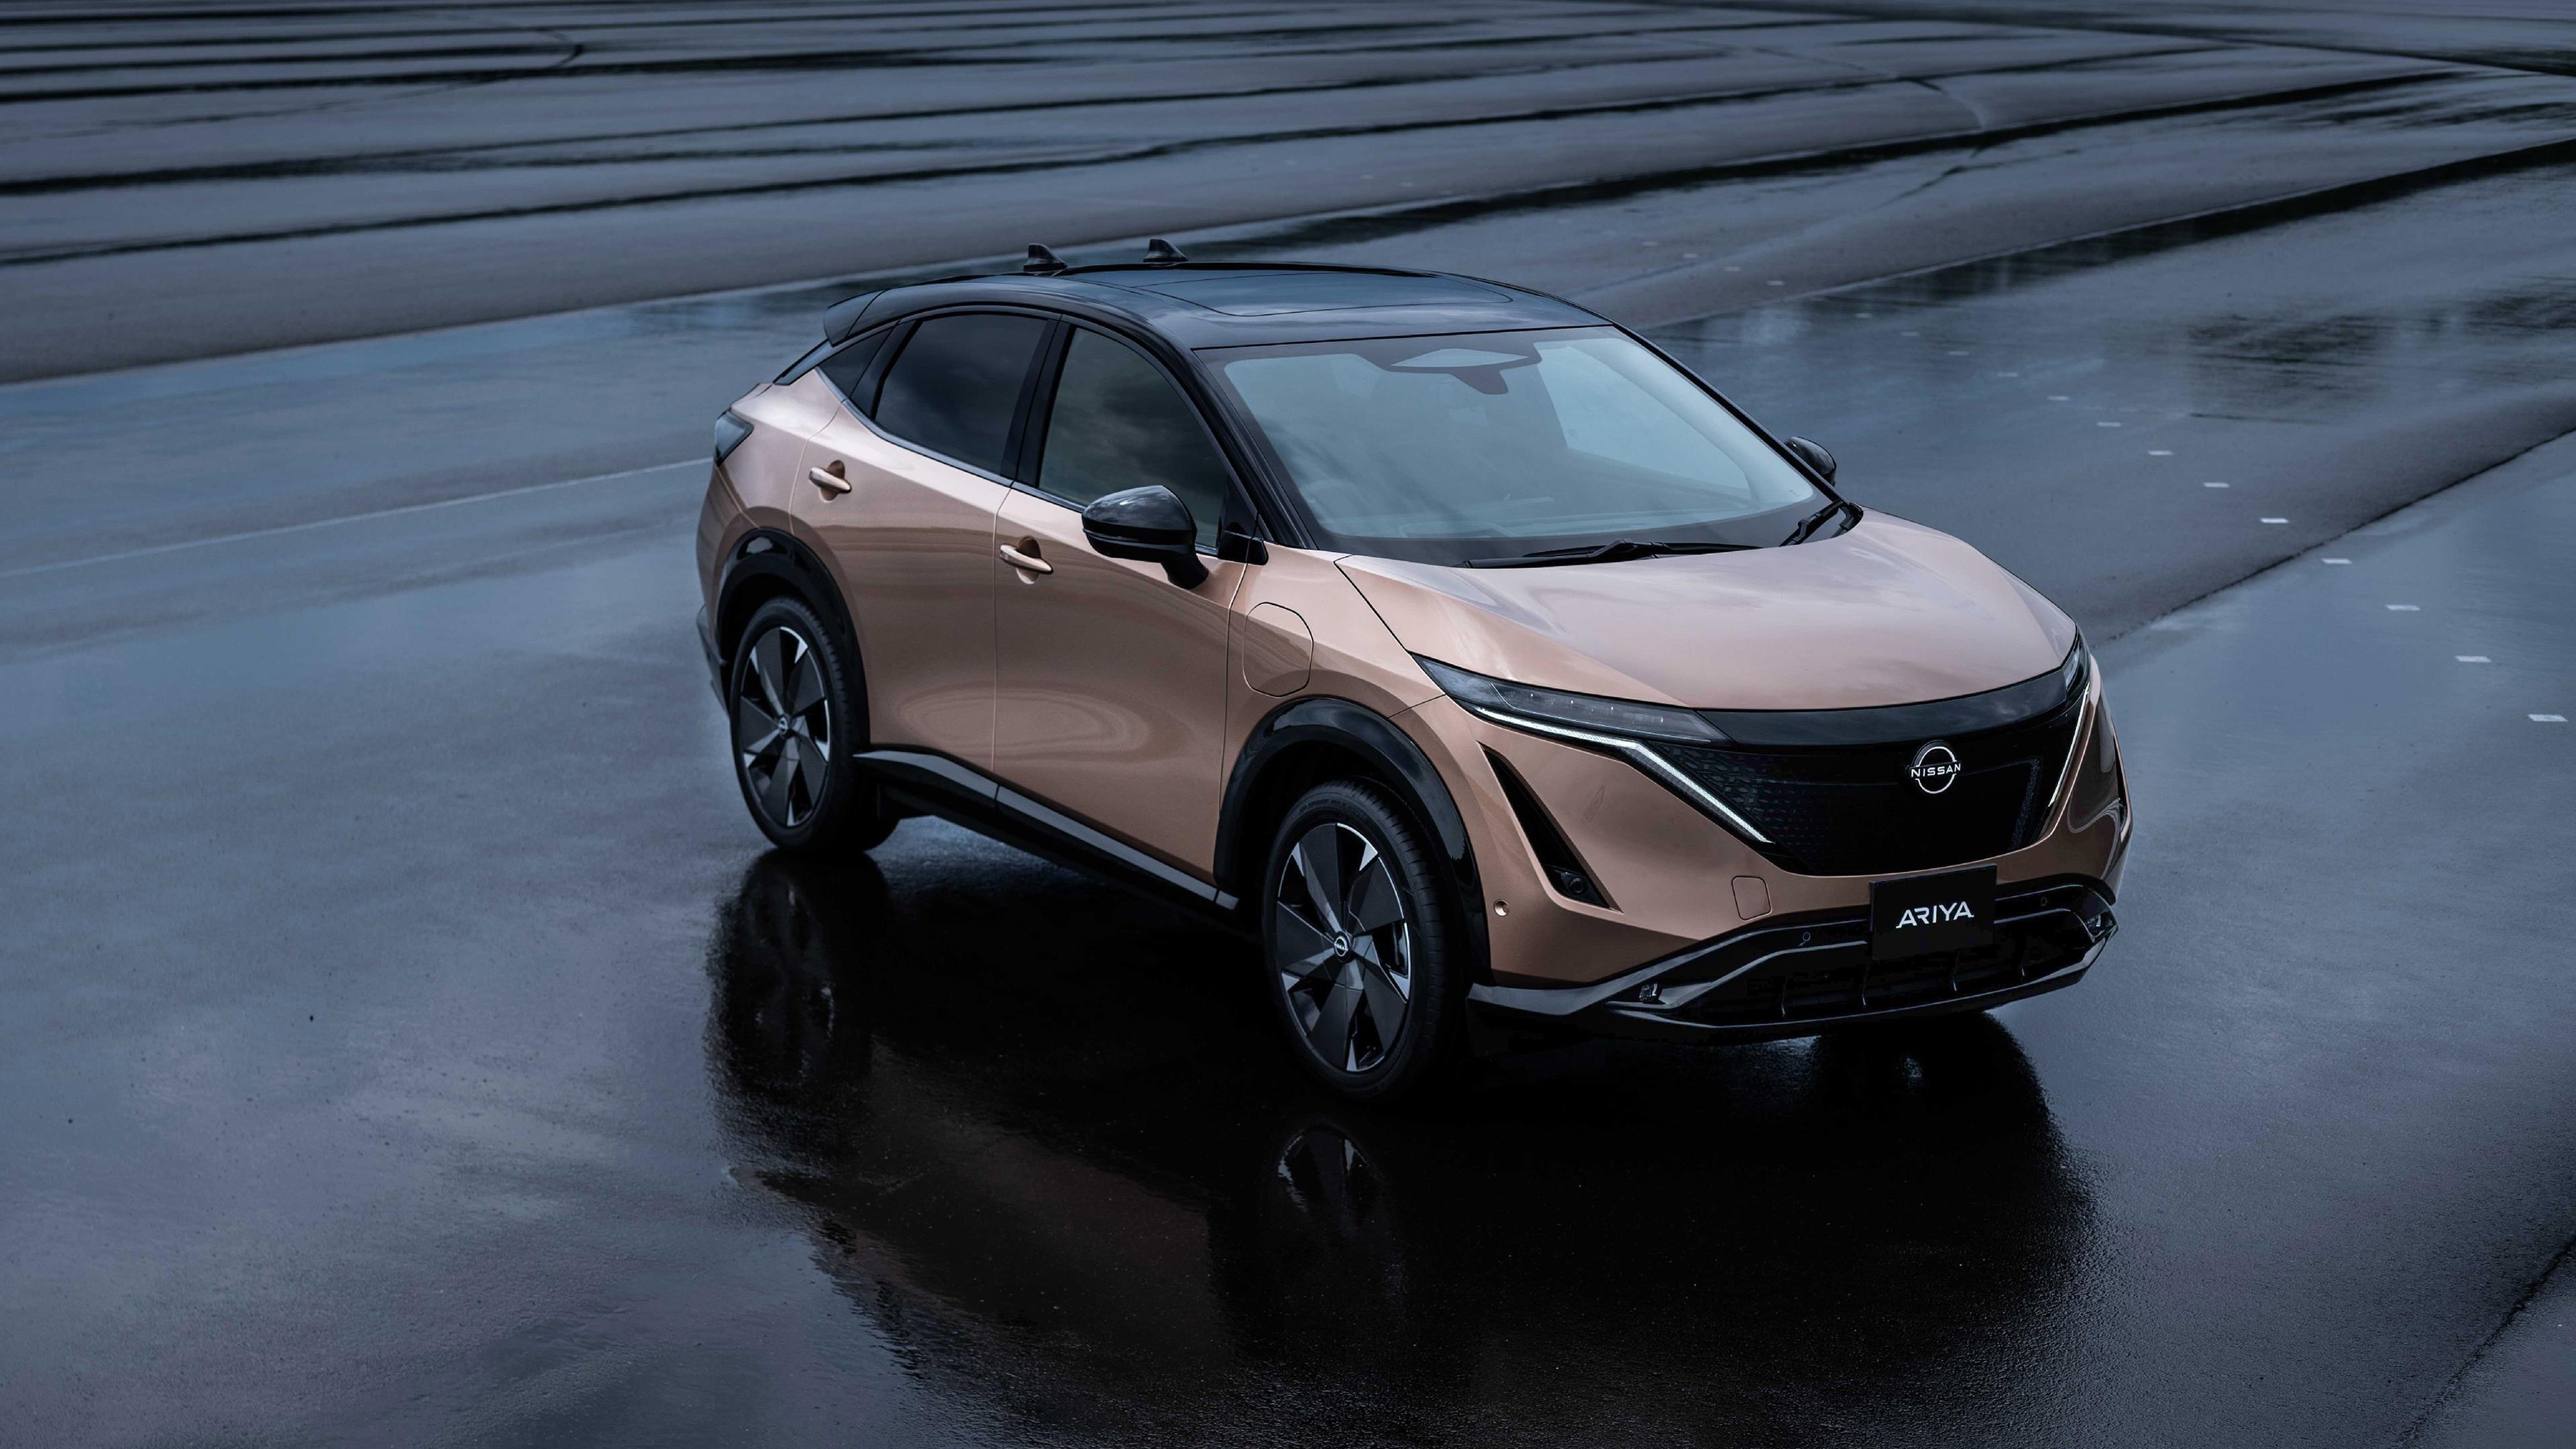 Nissan ariya e-4orce 2020 обои скачать